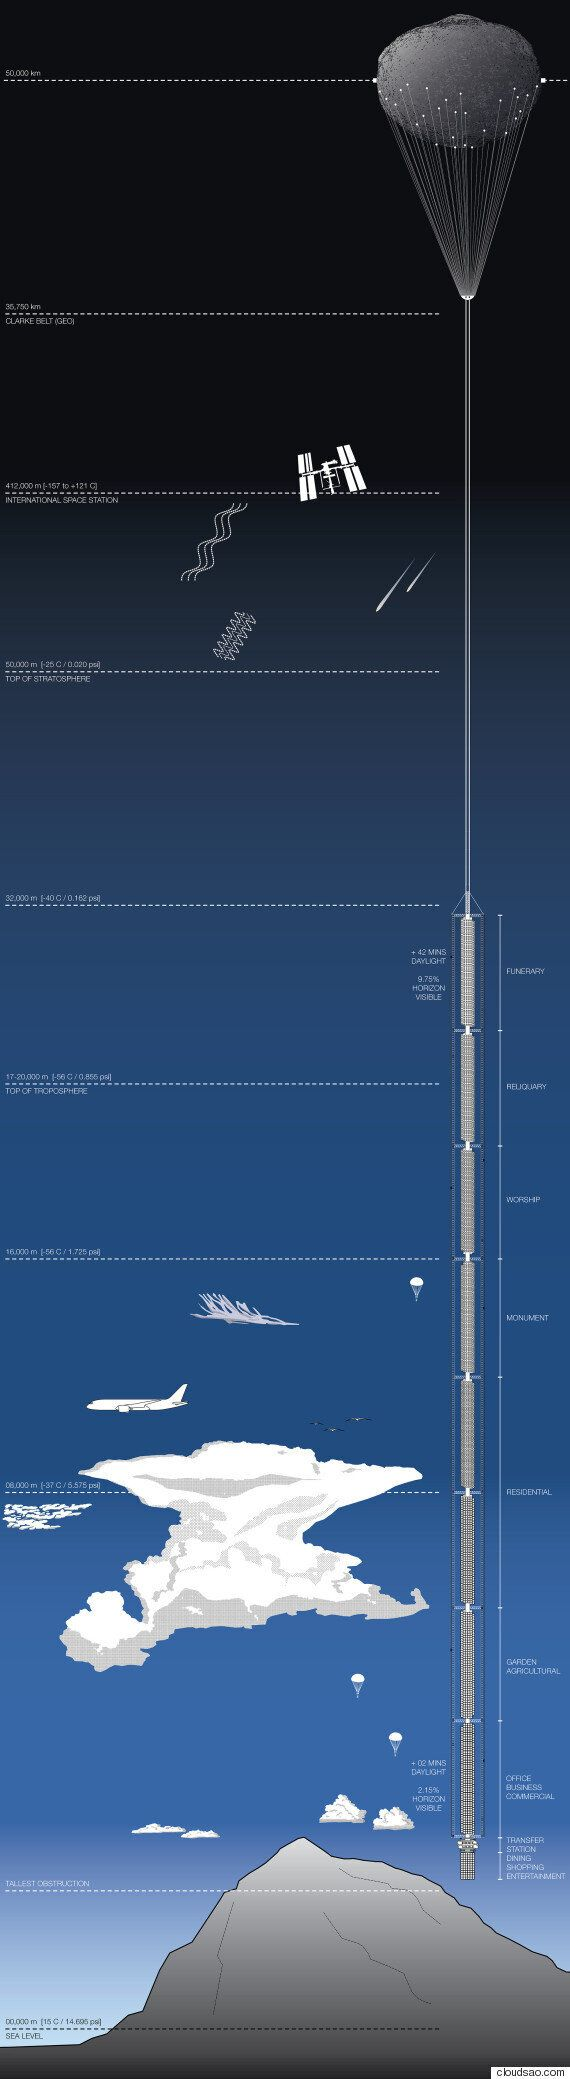 Analemma Tower: Ένας ουρανοξύστης ο οποίος κρέμεται από τον